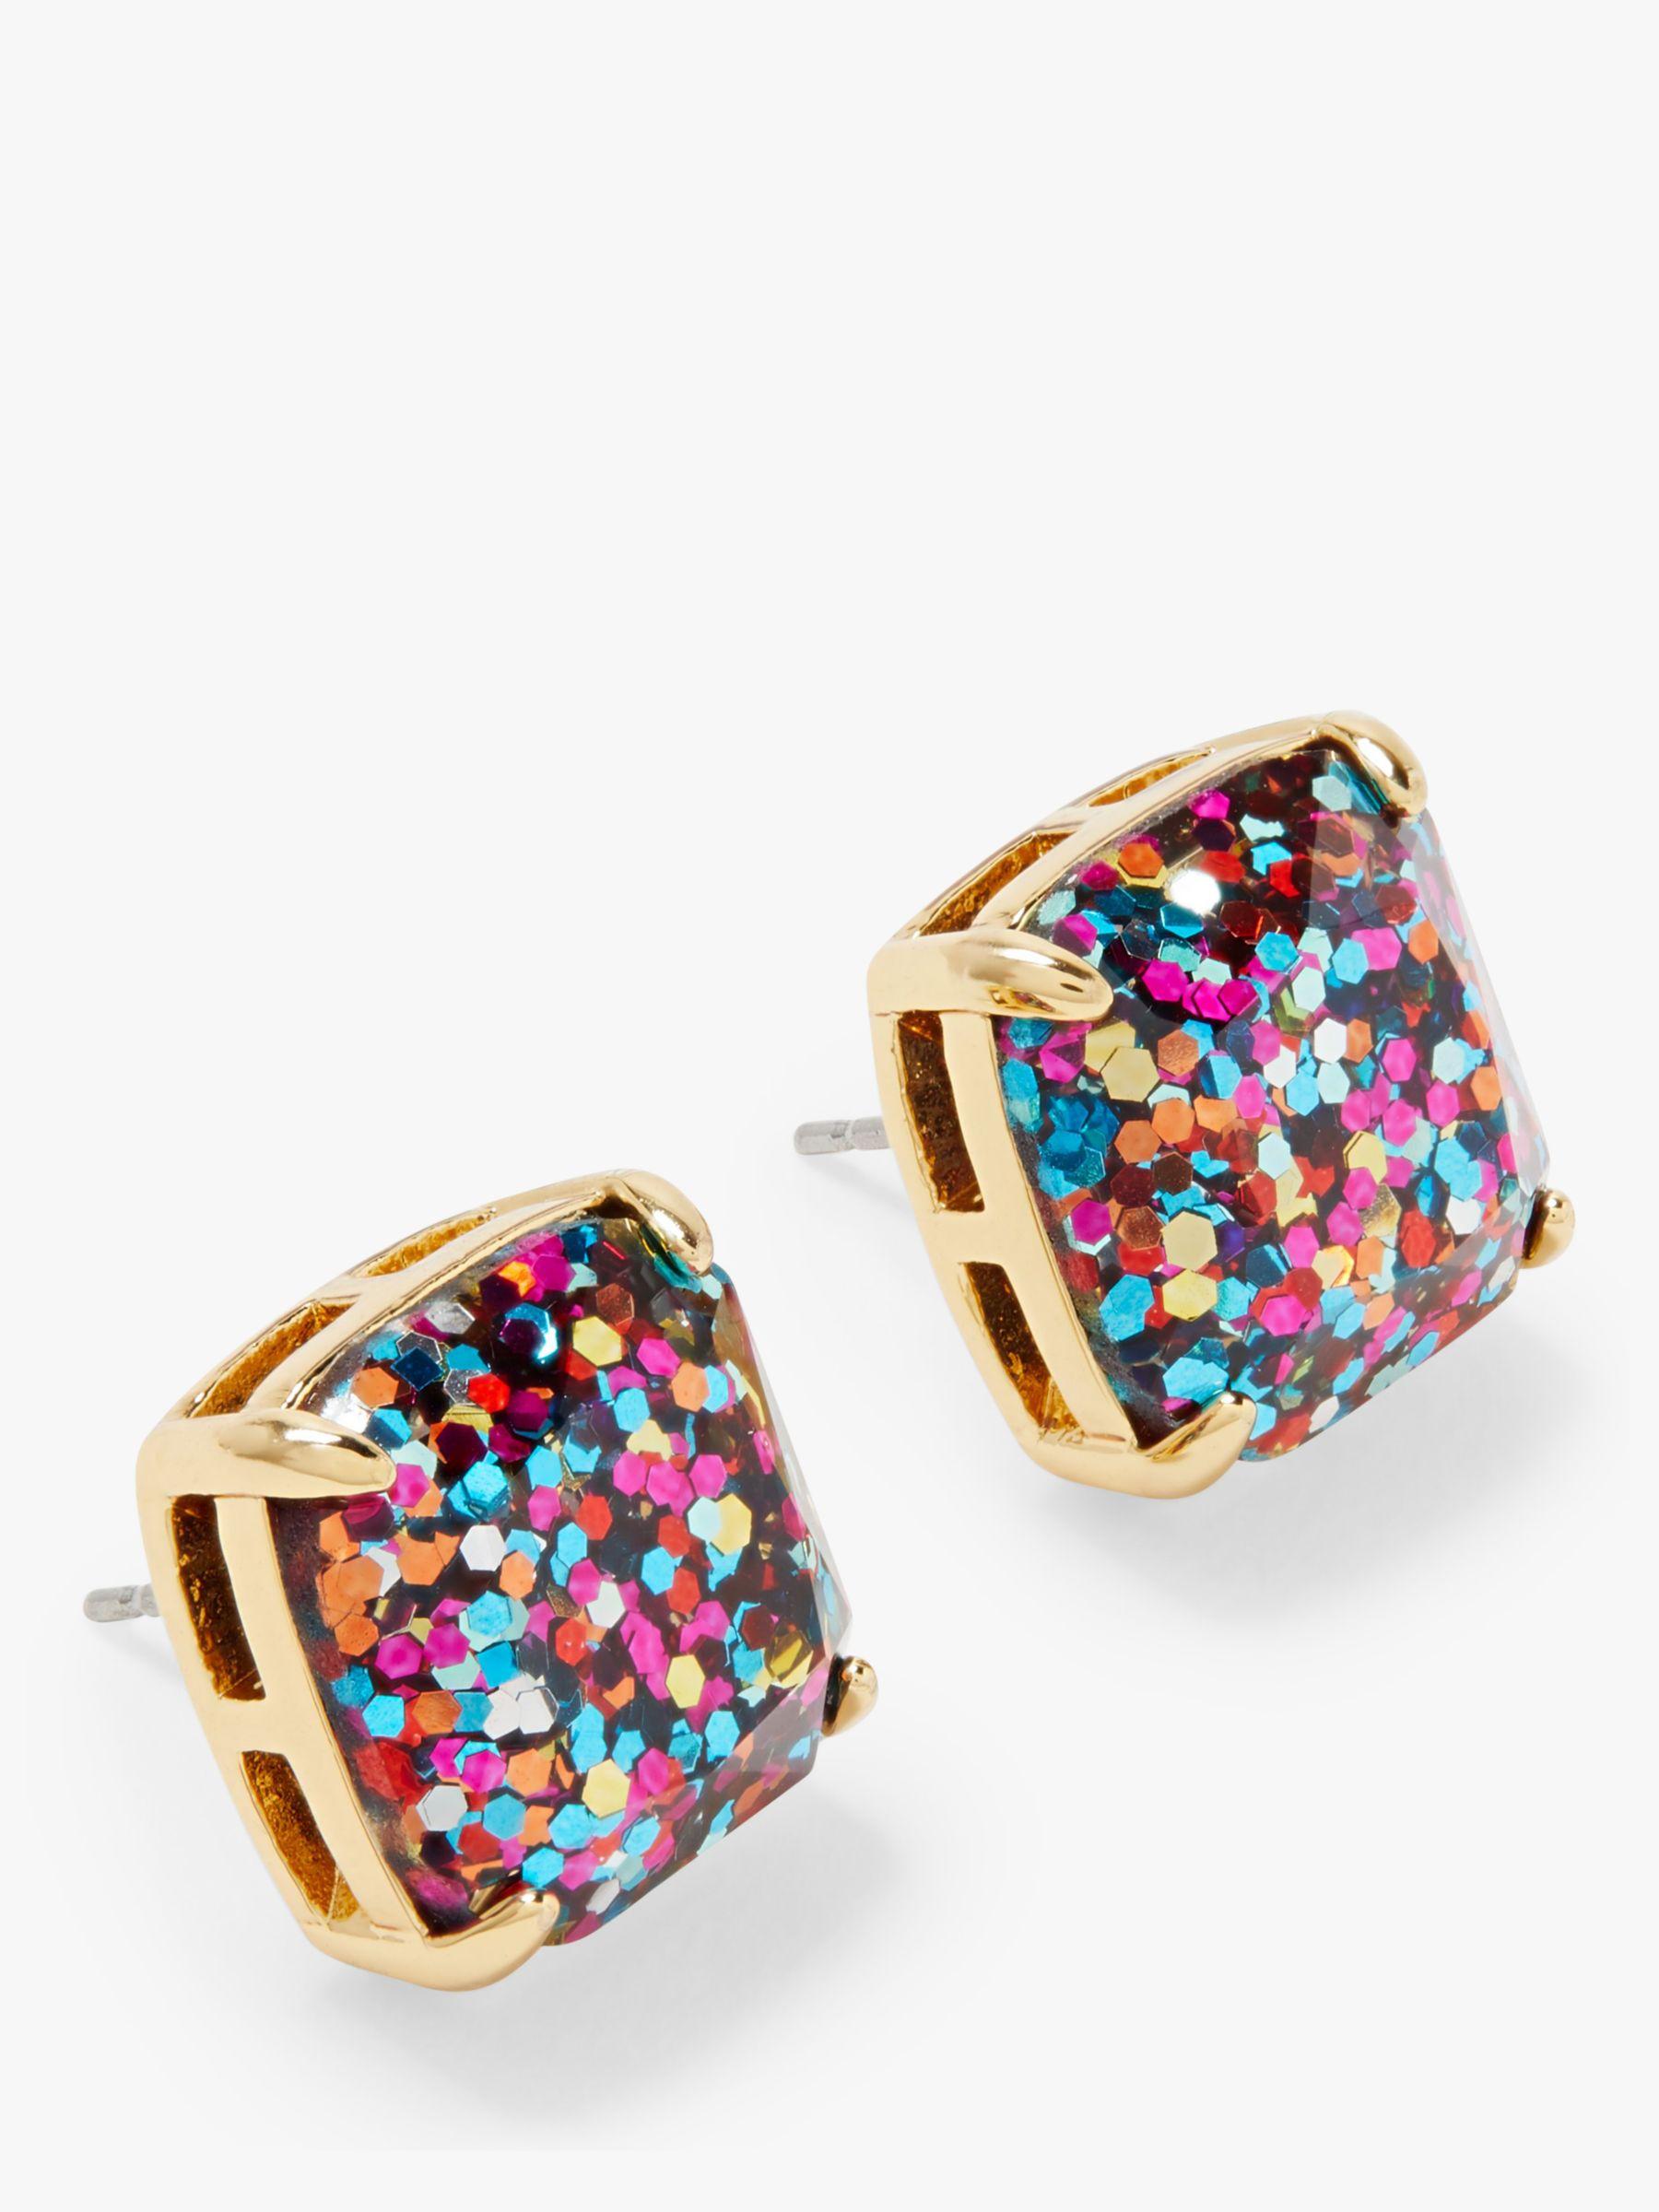 kate spade new york kate spade new york Small Square Glitter Stud Earrings, Gold/Multi